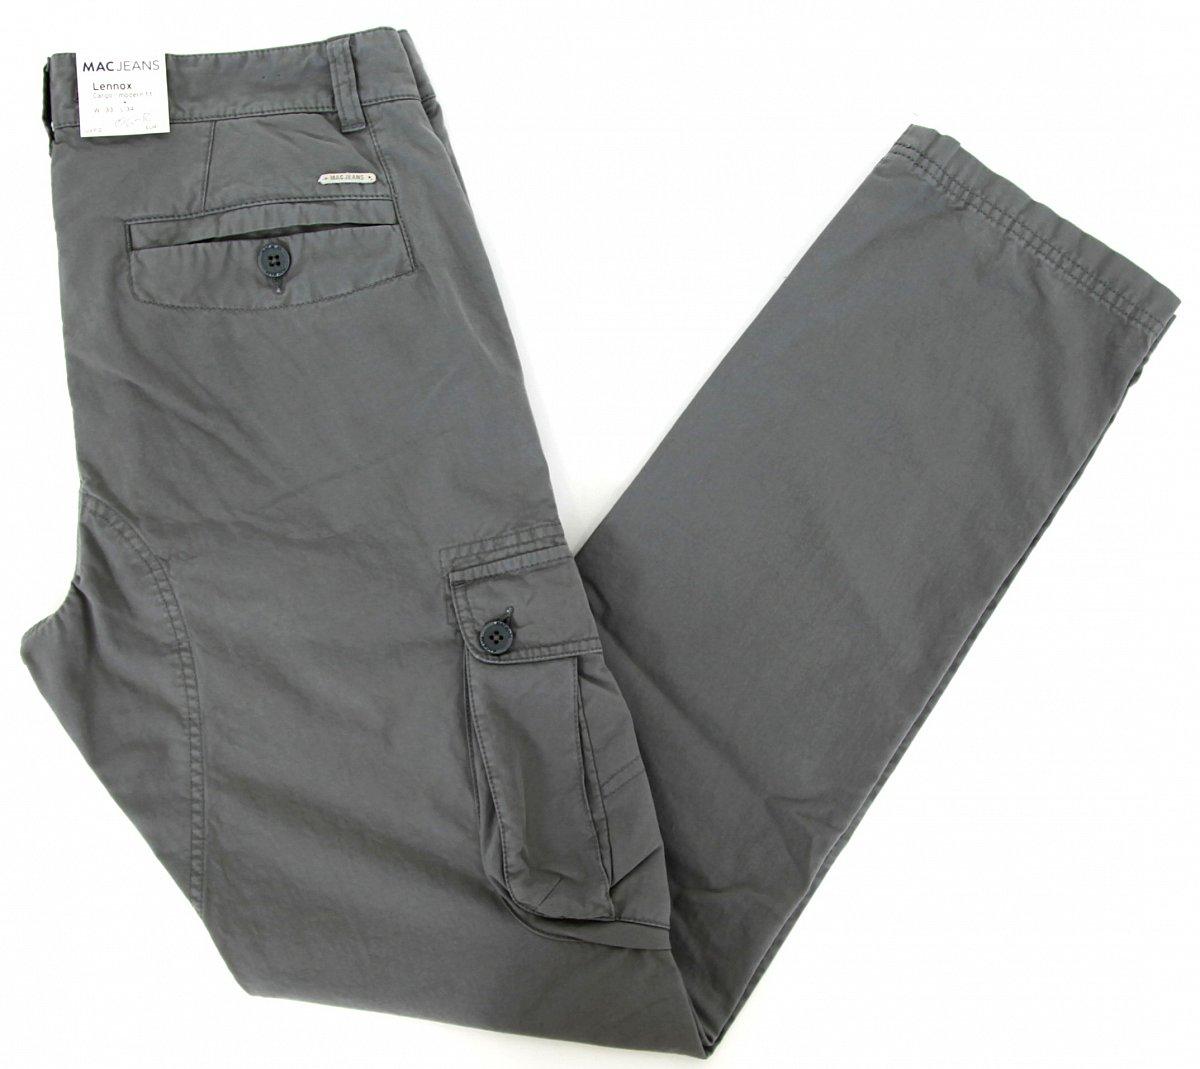 mac jeans herren hose men pants lennox cargo modern fit w33 l34 060r 057951 neu ebay. Black Bedroom Furniture Sets. Home Design Ideas